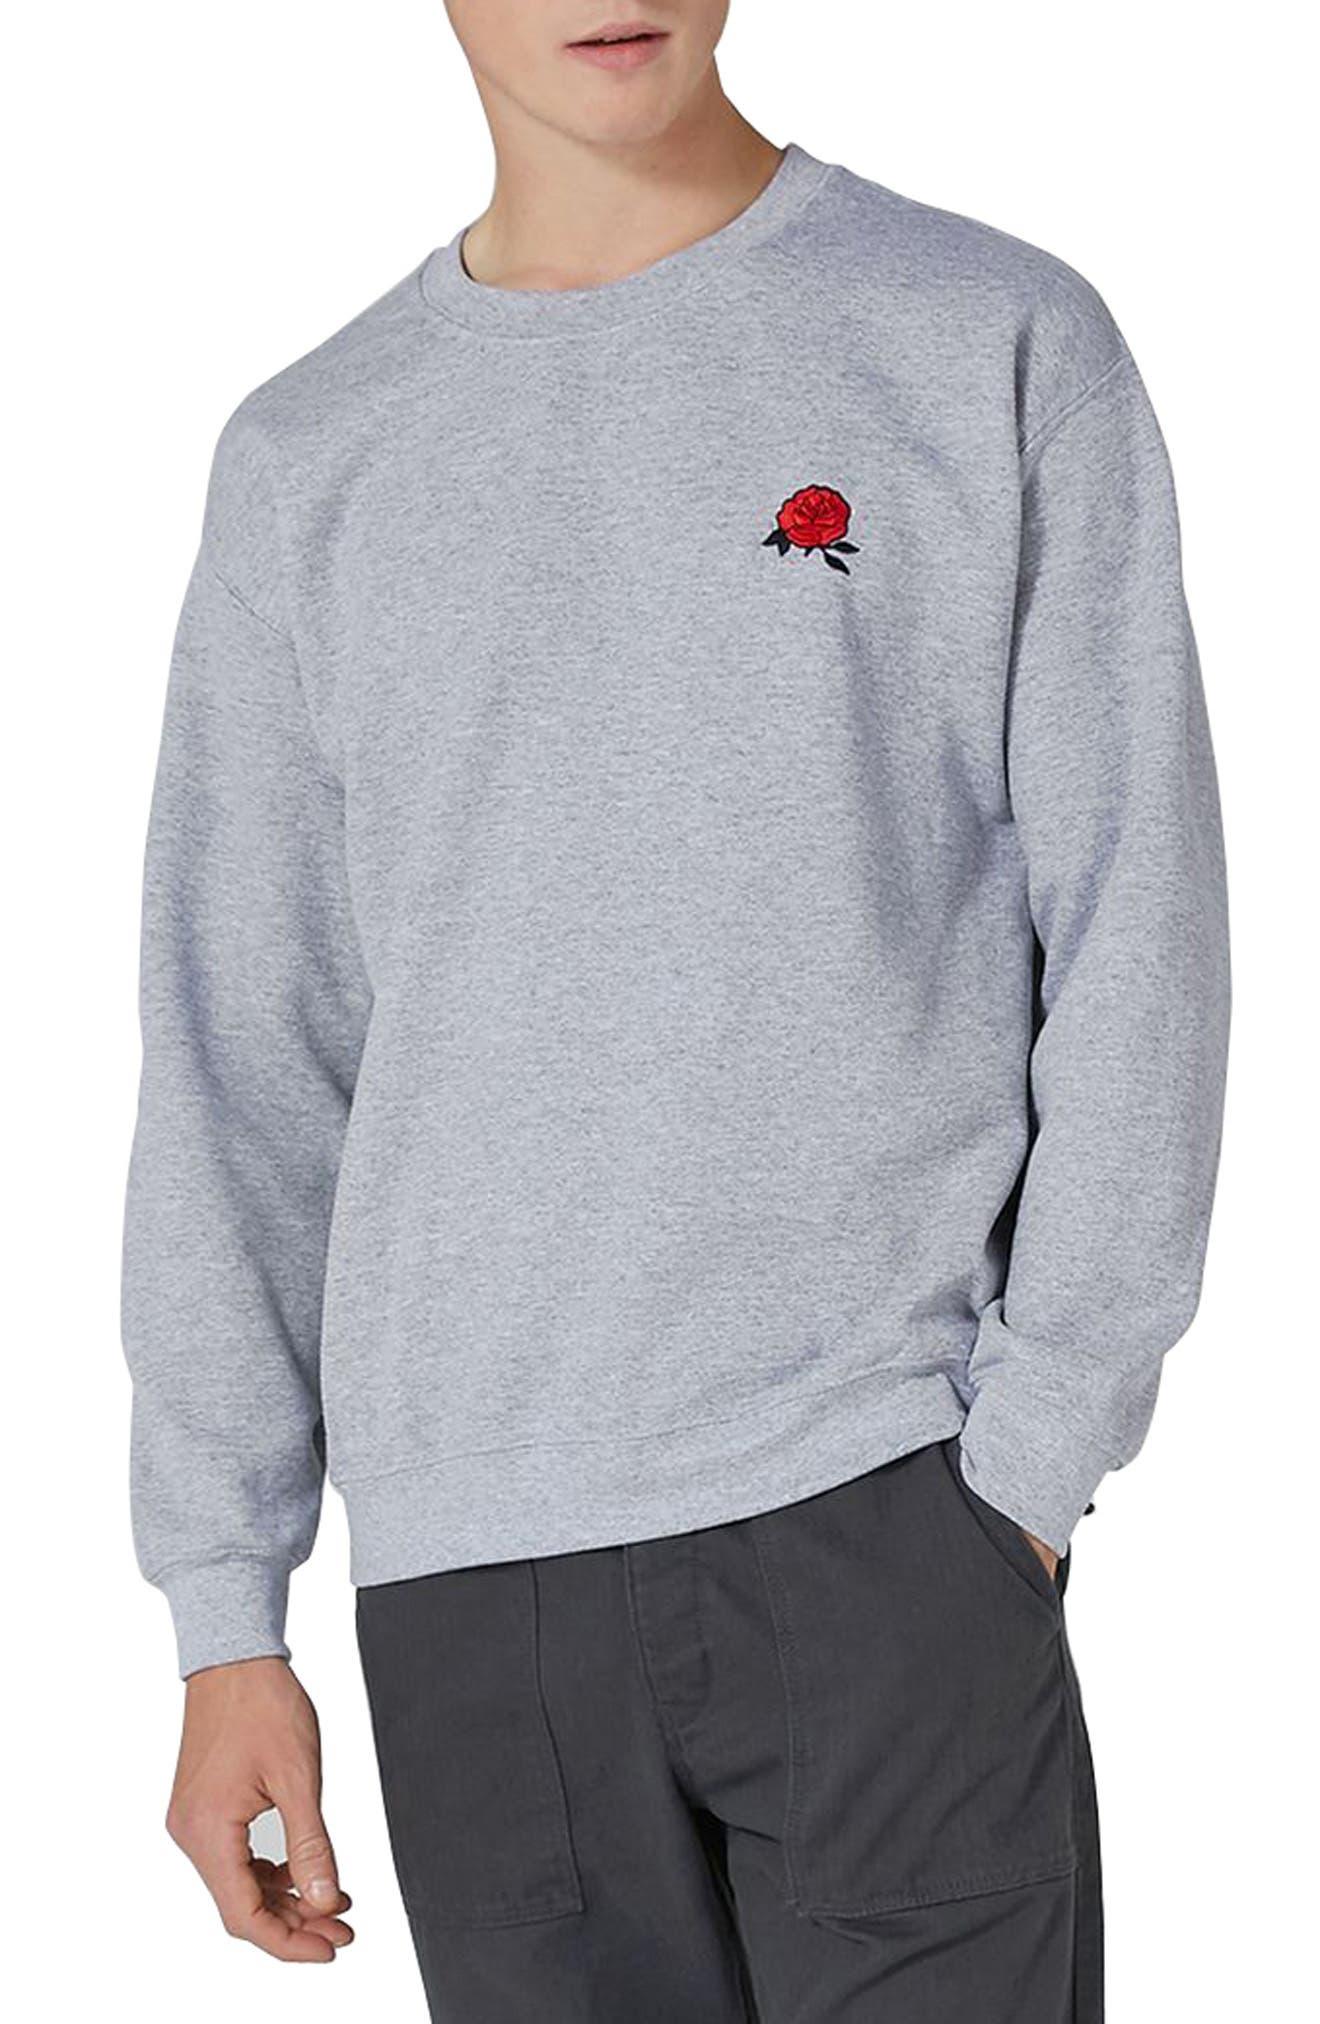 Main Image - Topman Rose Embroidered Sweatshirt